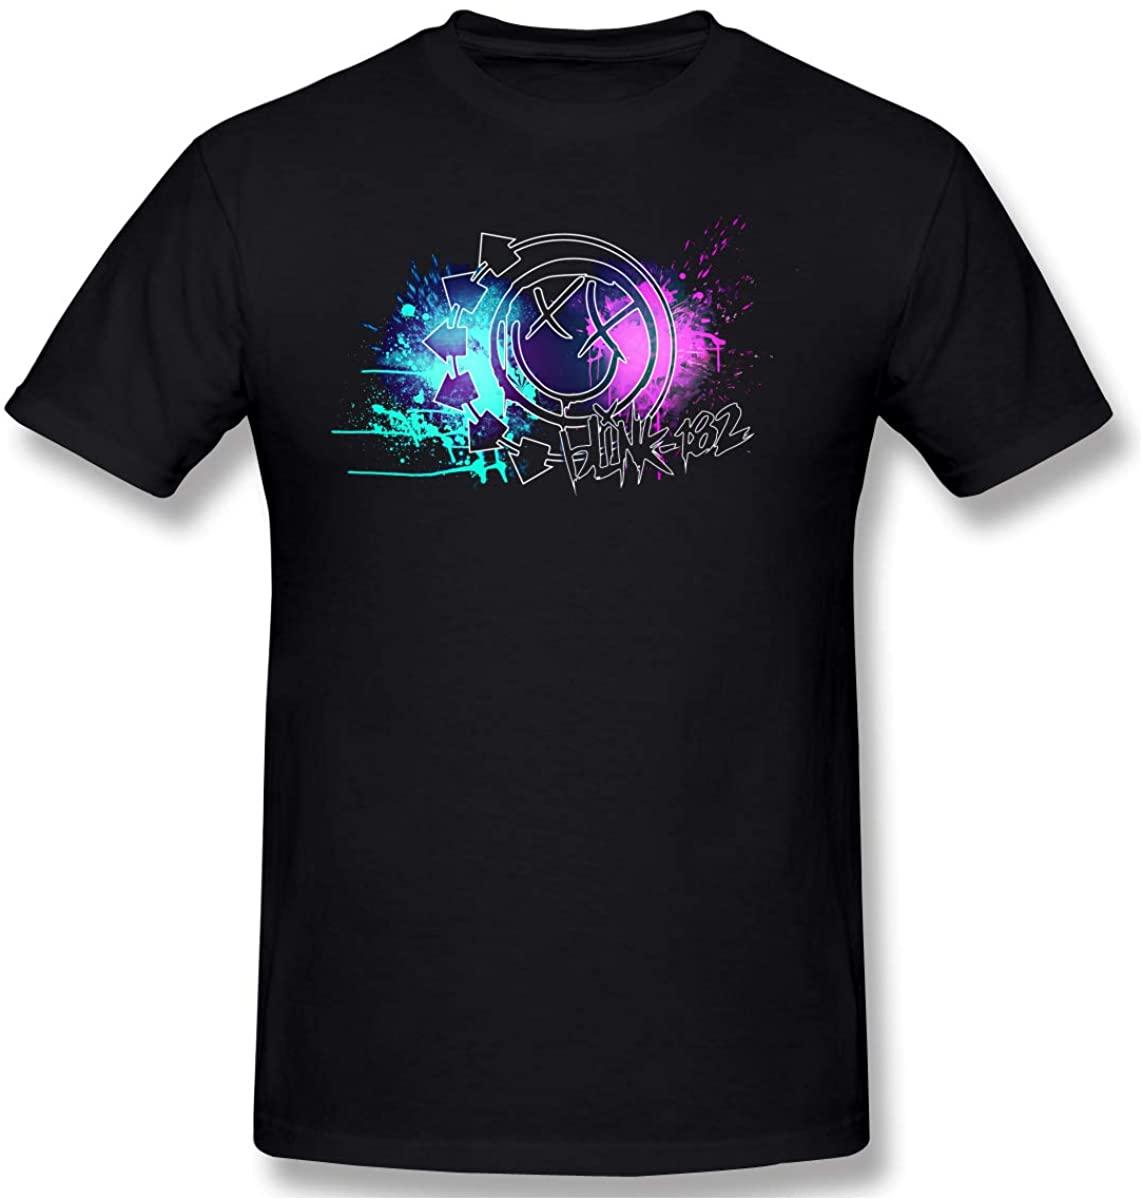 B-L-I-N-K 182 Men's Comfortable and Stylish T-Shirt